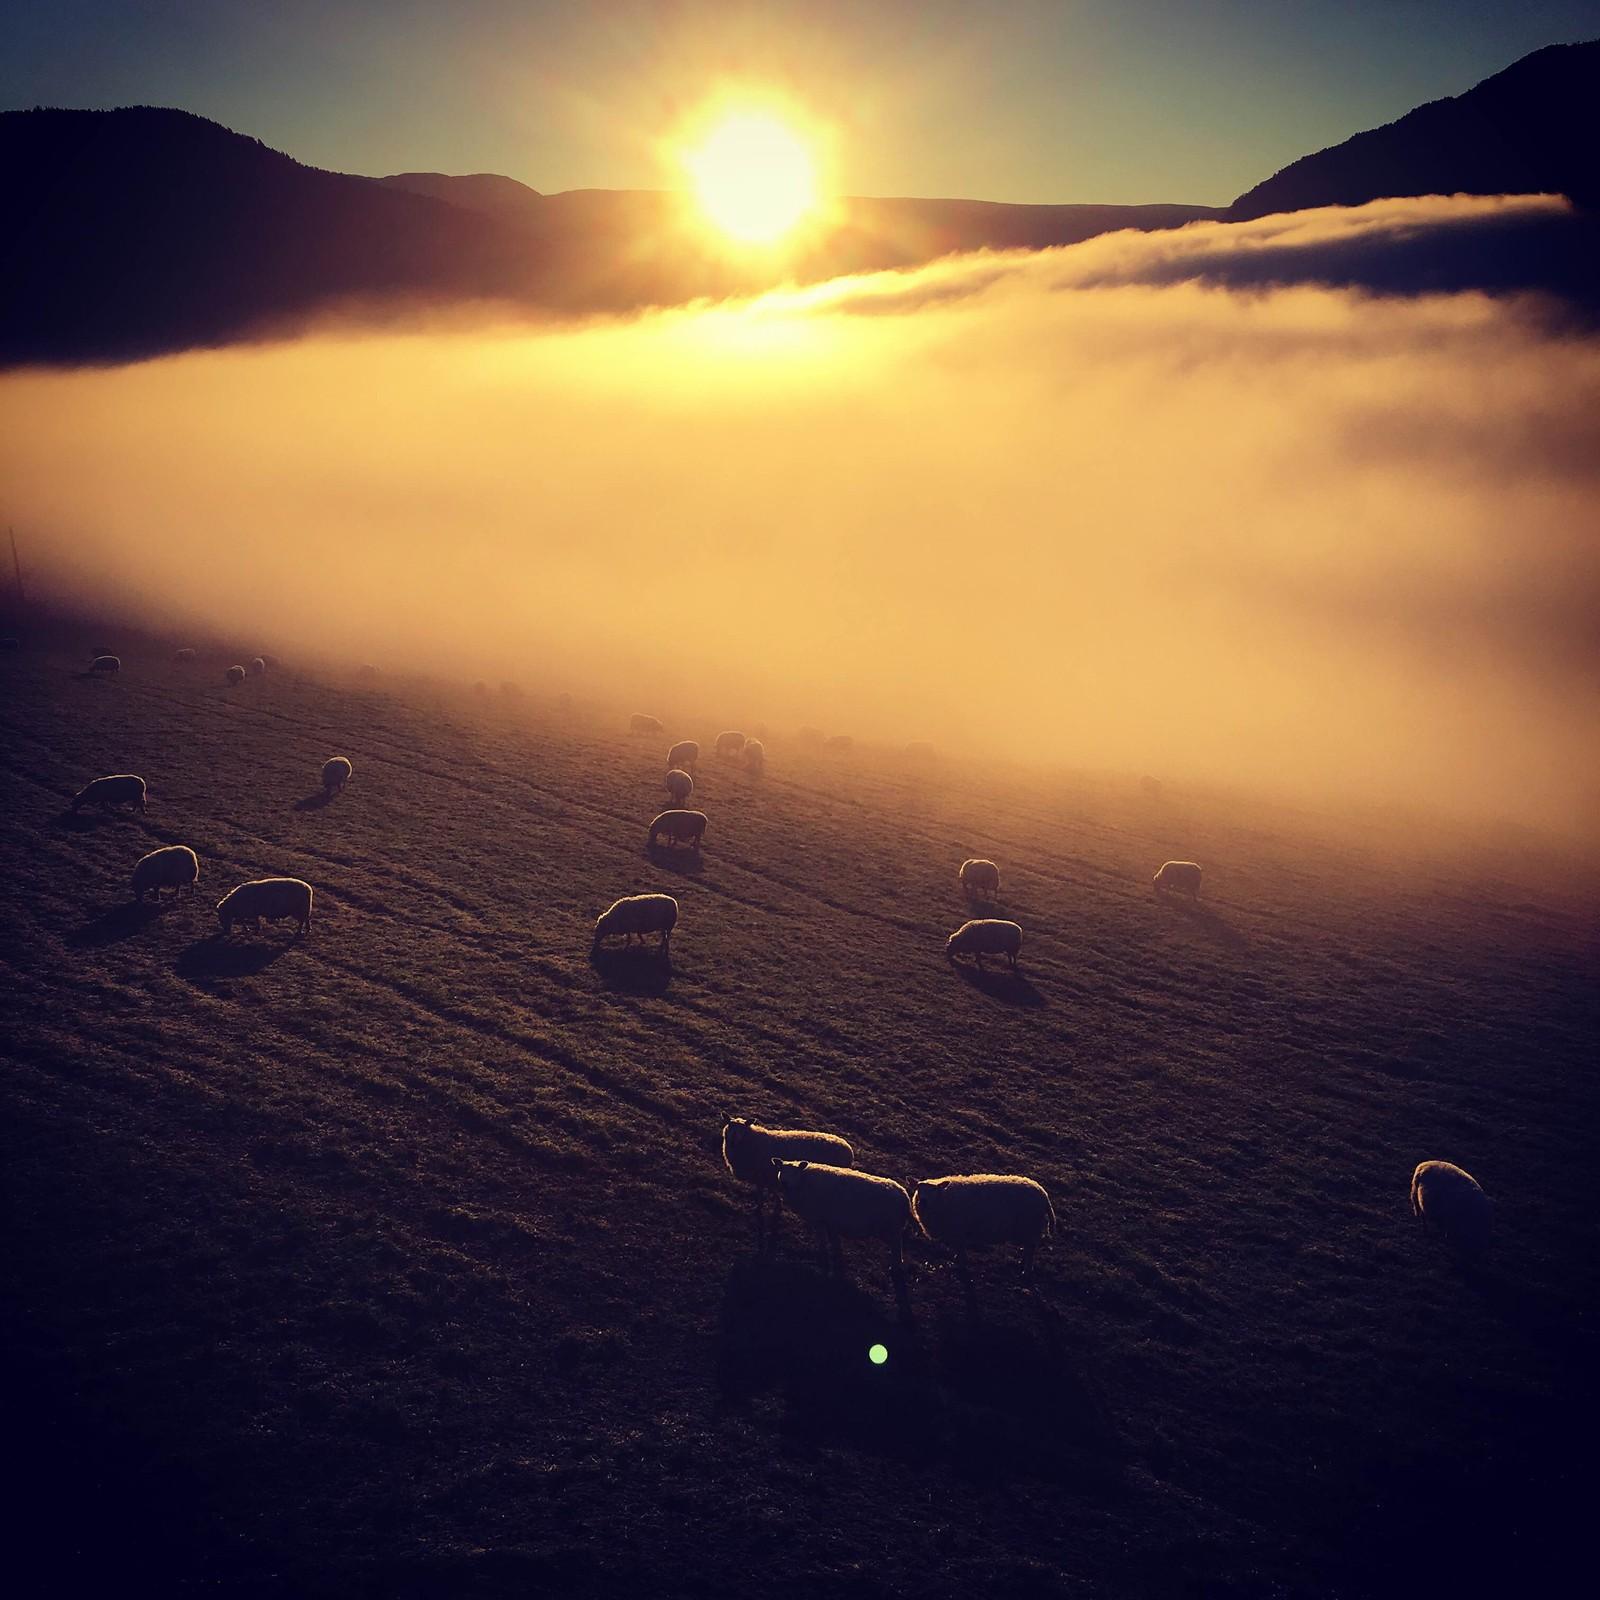 Sauer i soloppgang på Alme.